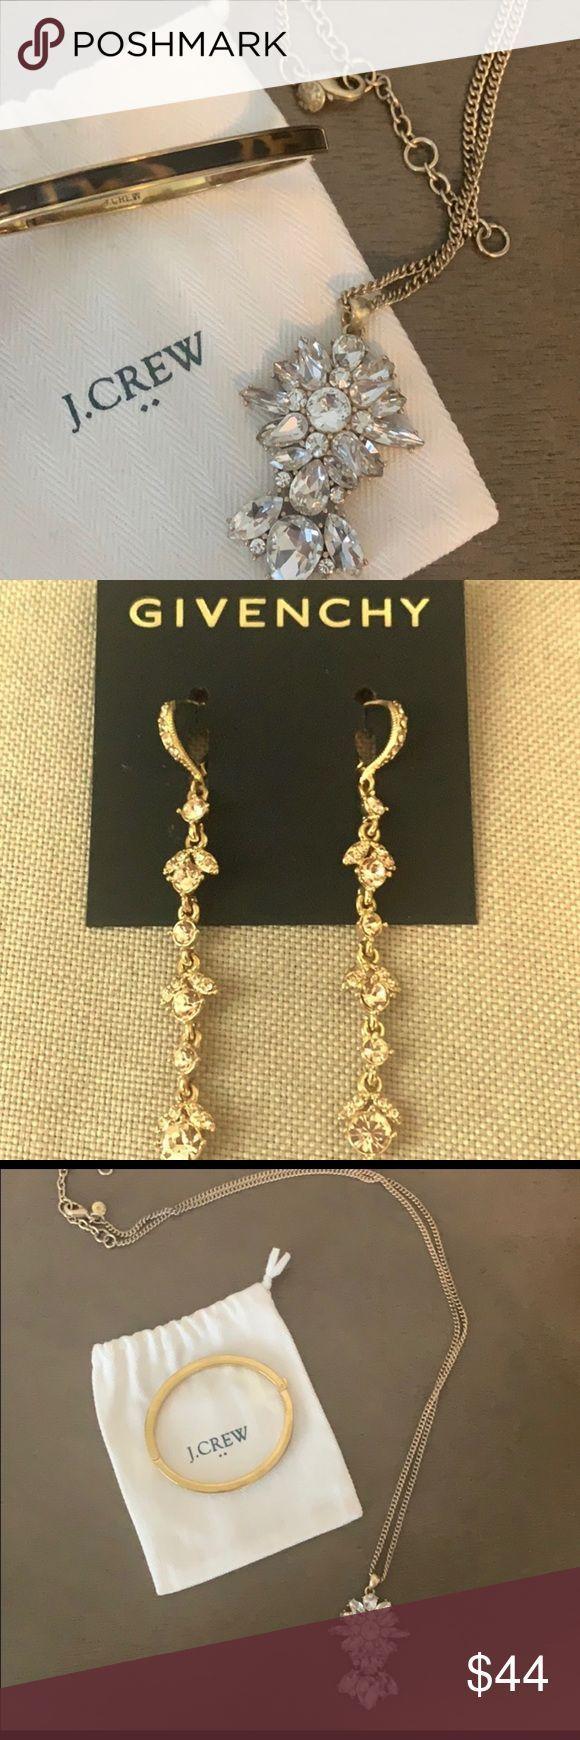 Jewelry bundle, Givenchy, NWT, and J. crew Offering major savings, J. Crew antiq…,  #antiq …